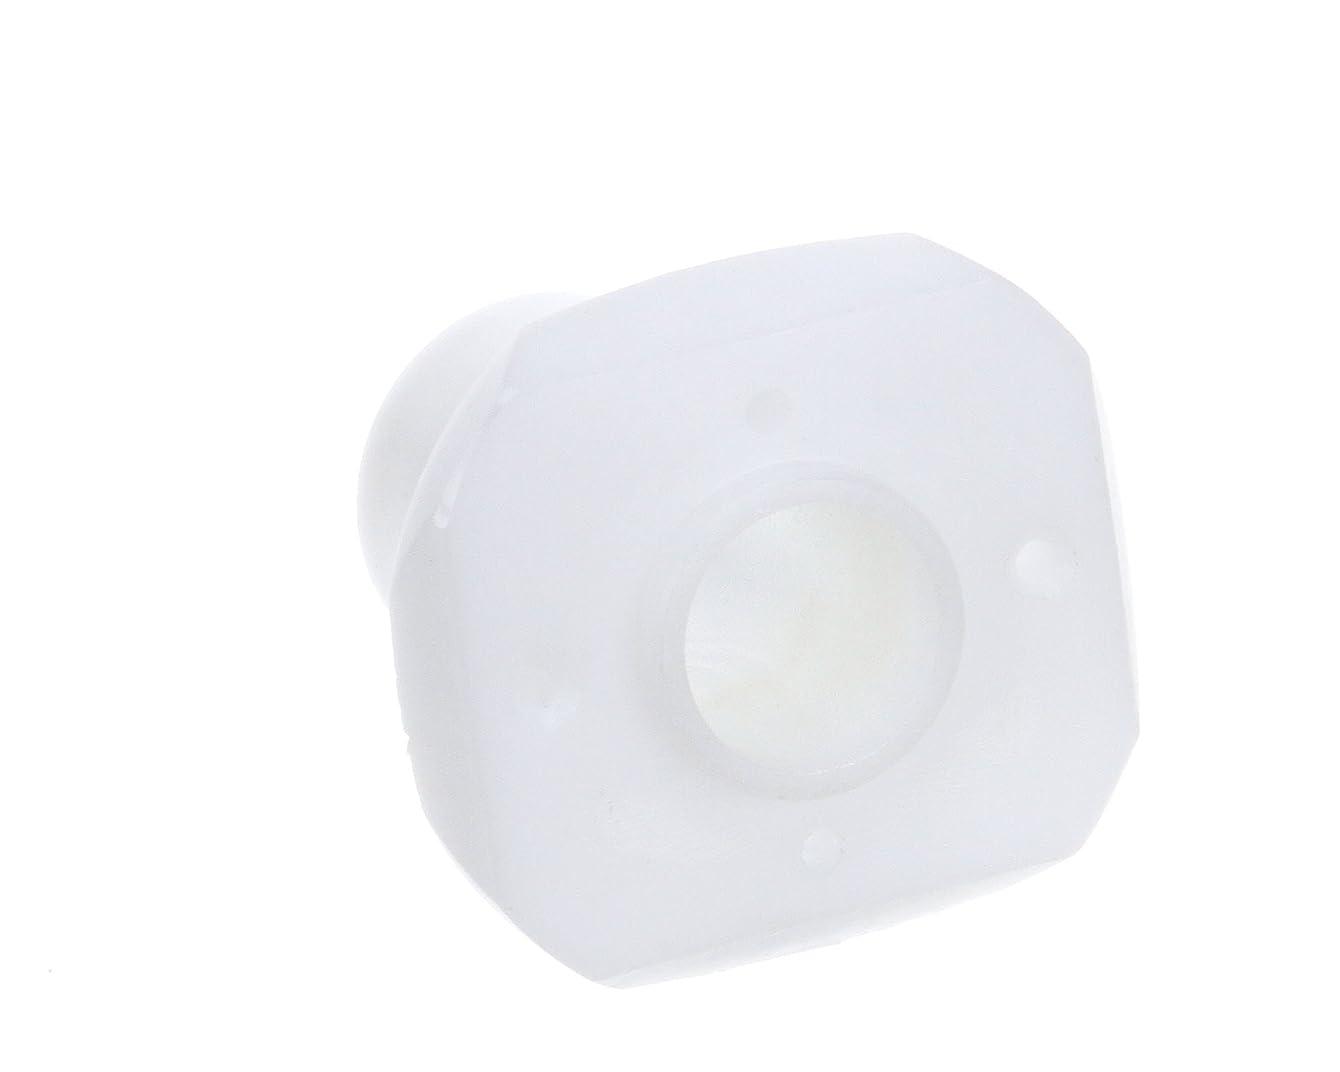 Champion - Moyer Diebel 207096 Wash arm Bearing for Dh5000 Dishwasher